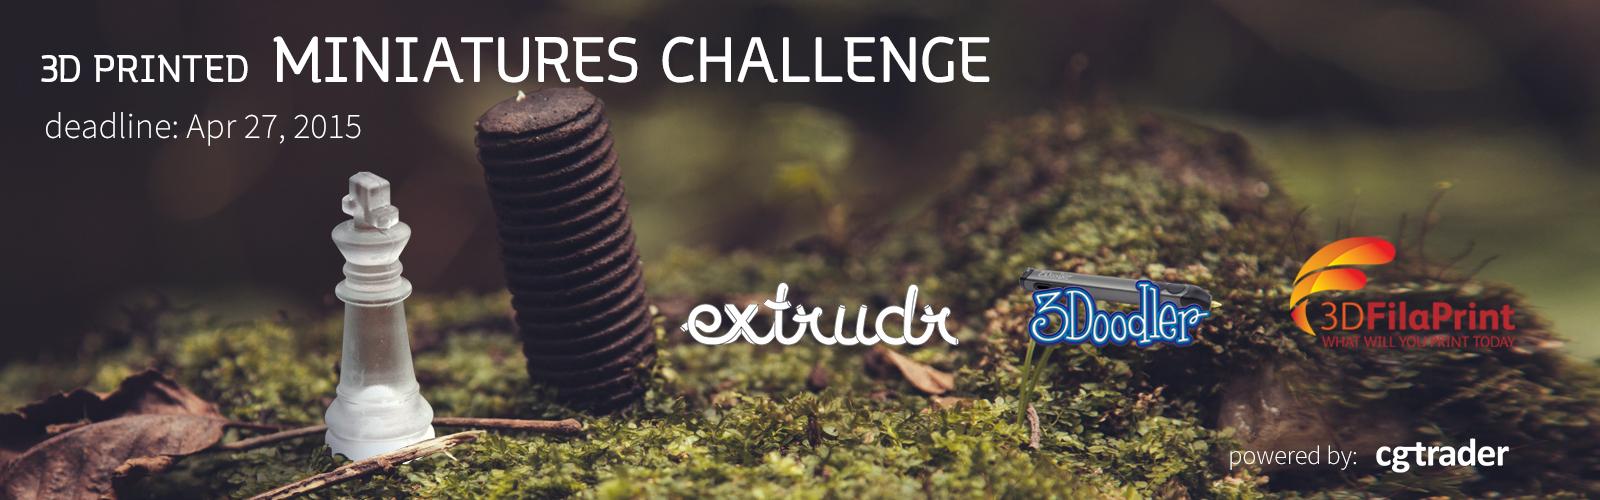 3D Printed Miniatures Challenge